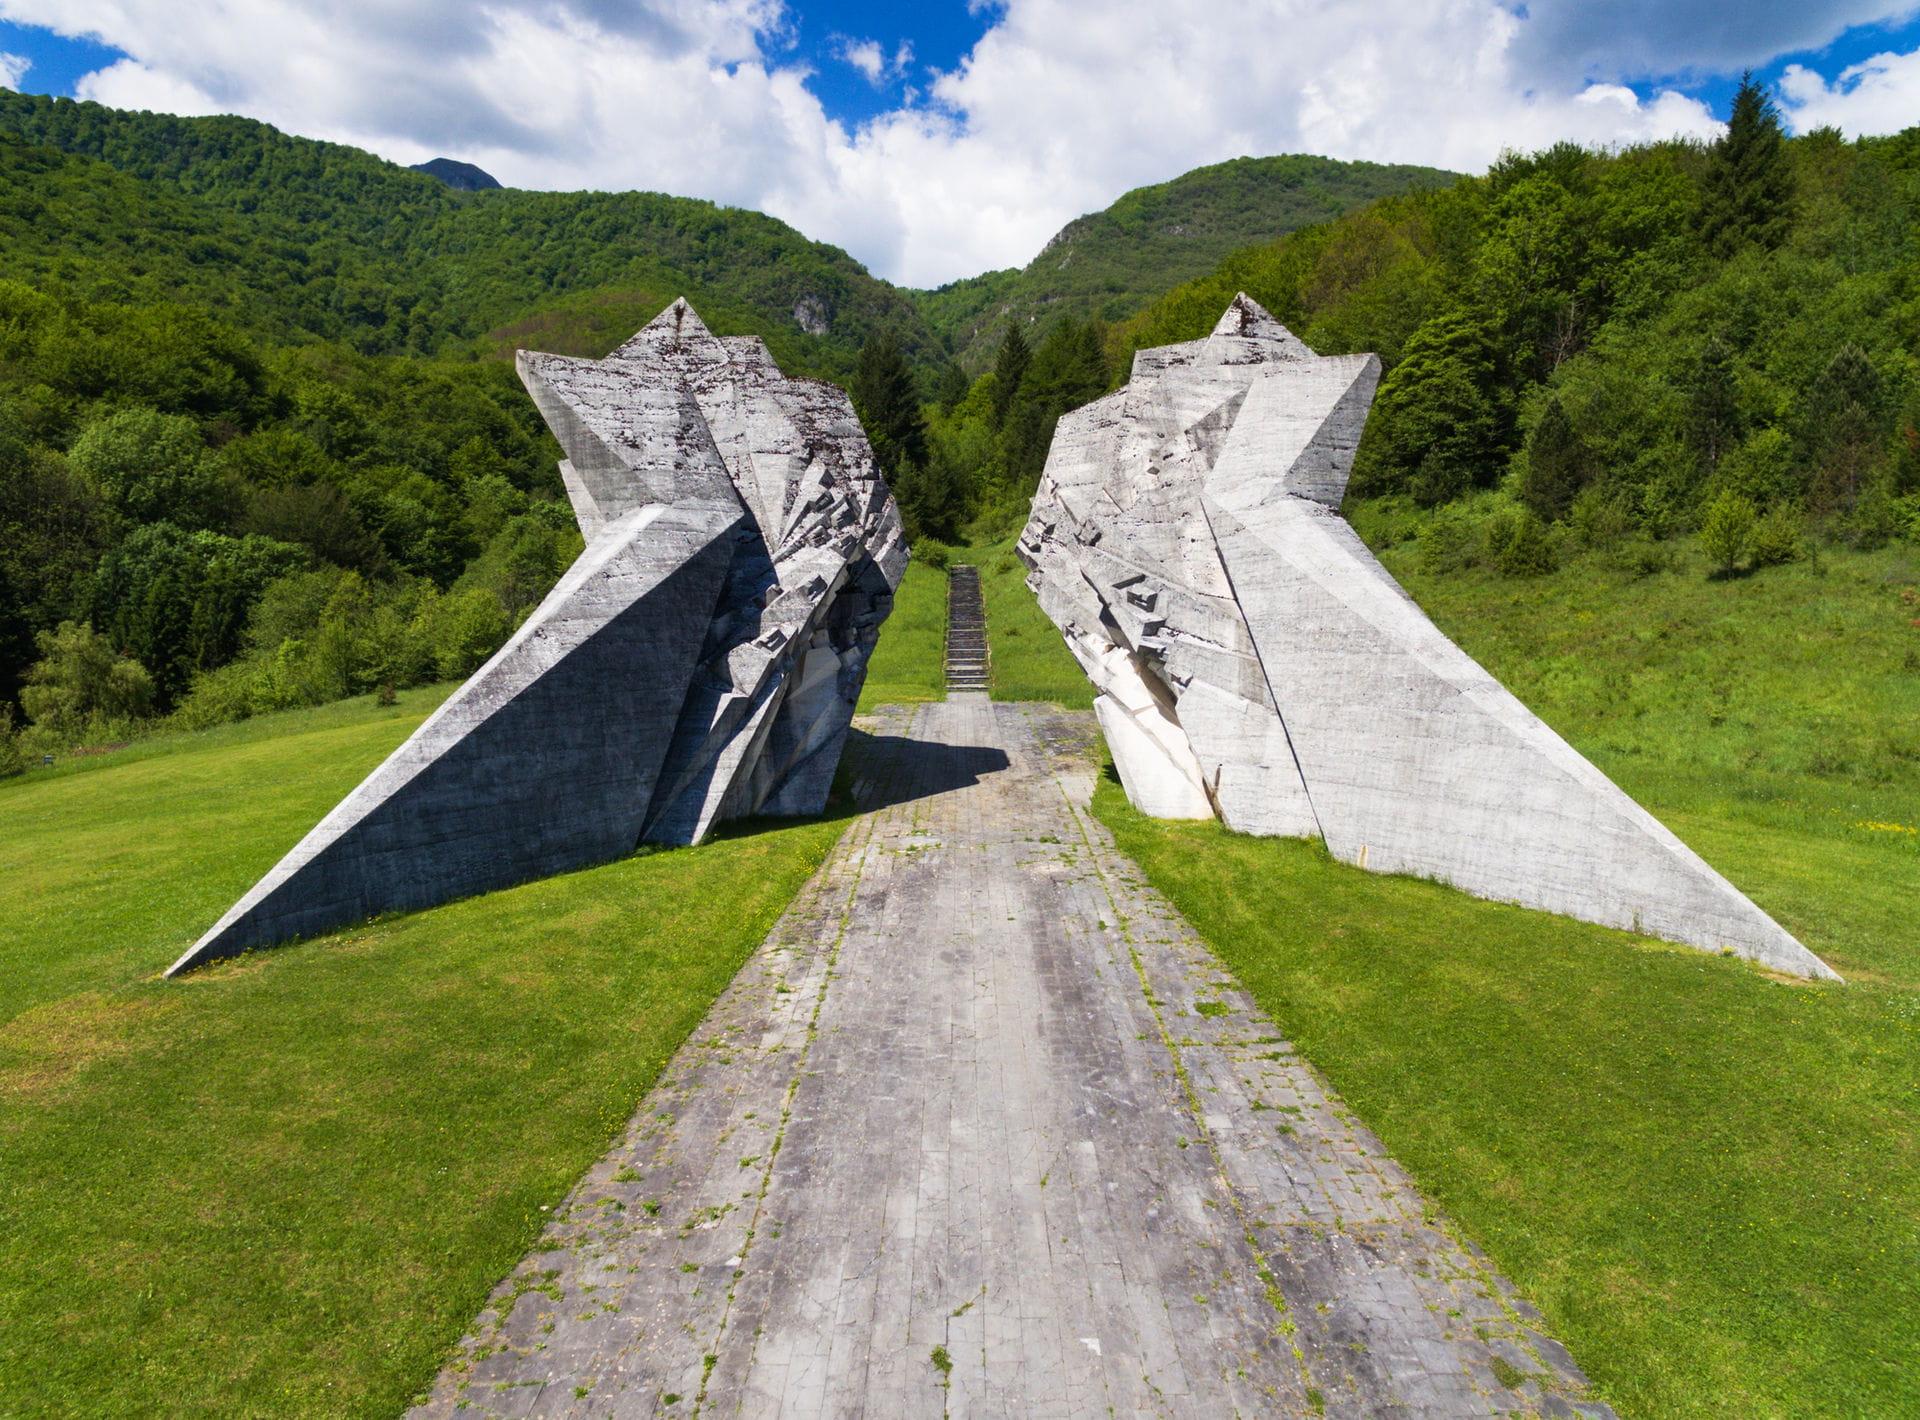 High quality hoto of Tjentiste War Memorial - Bosnia and Herzegovina